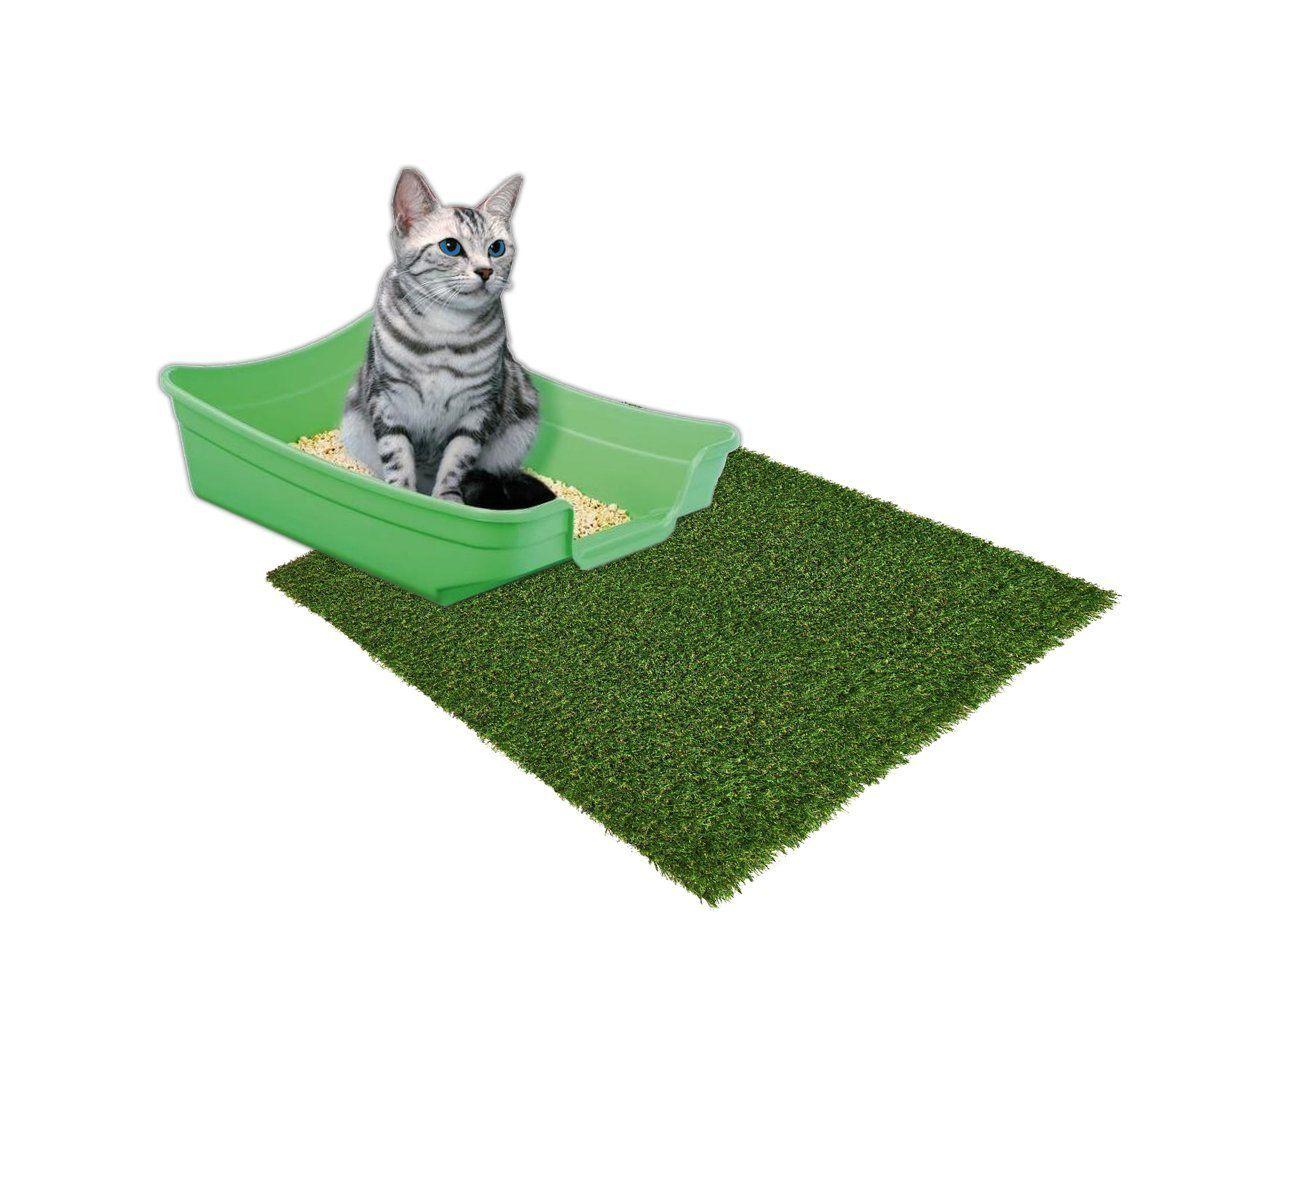 Cat Litter Mat by AmeriDecor XL 24in x 31in Size